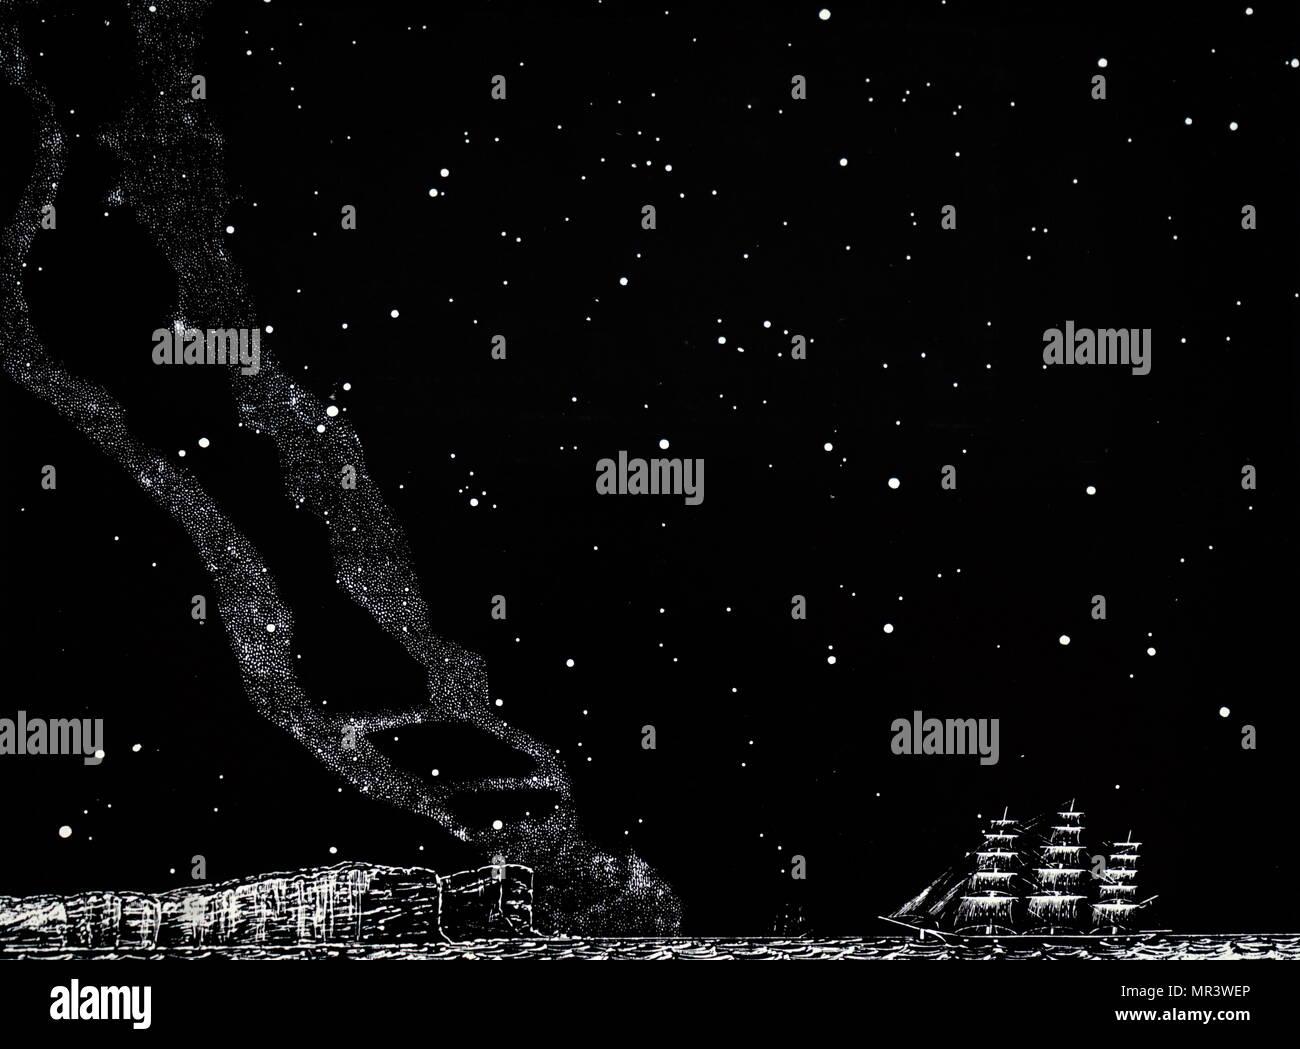 Star Sky Of The Southern Hemisphere Stock Photos & Star Sky